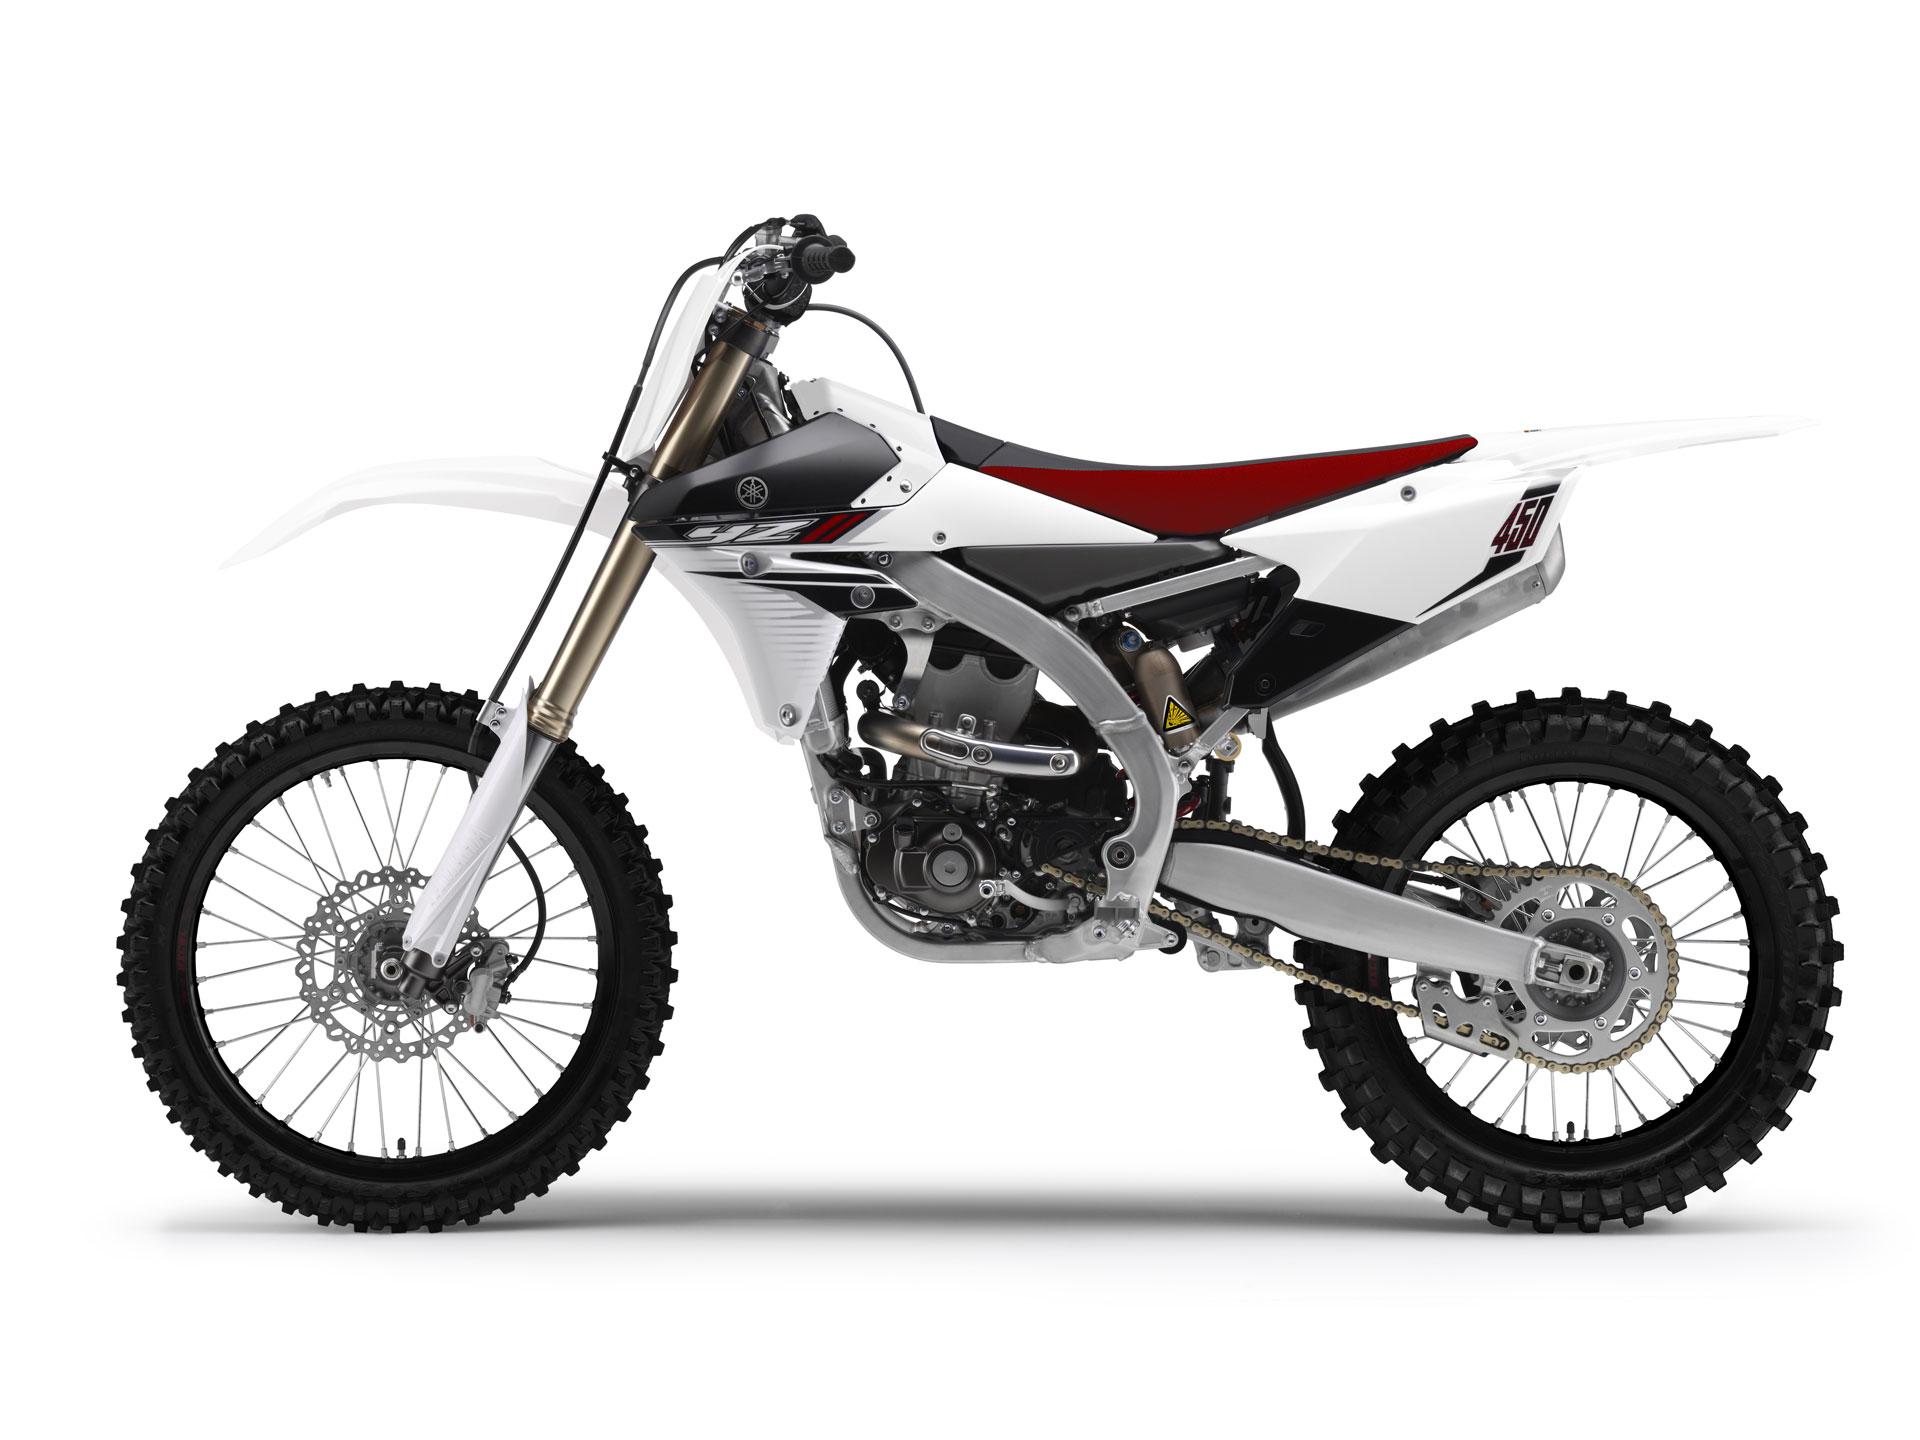 Gallery Yamaha Yzf 450 2014